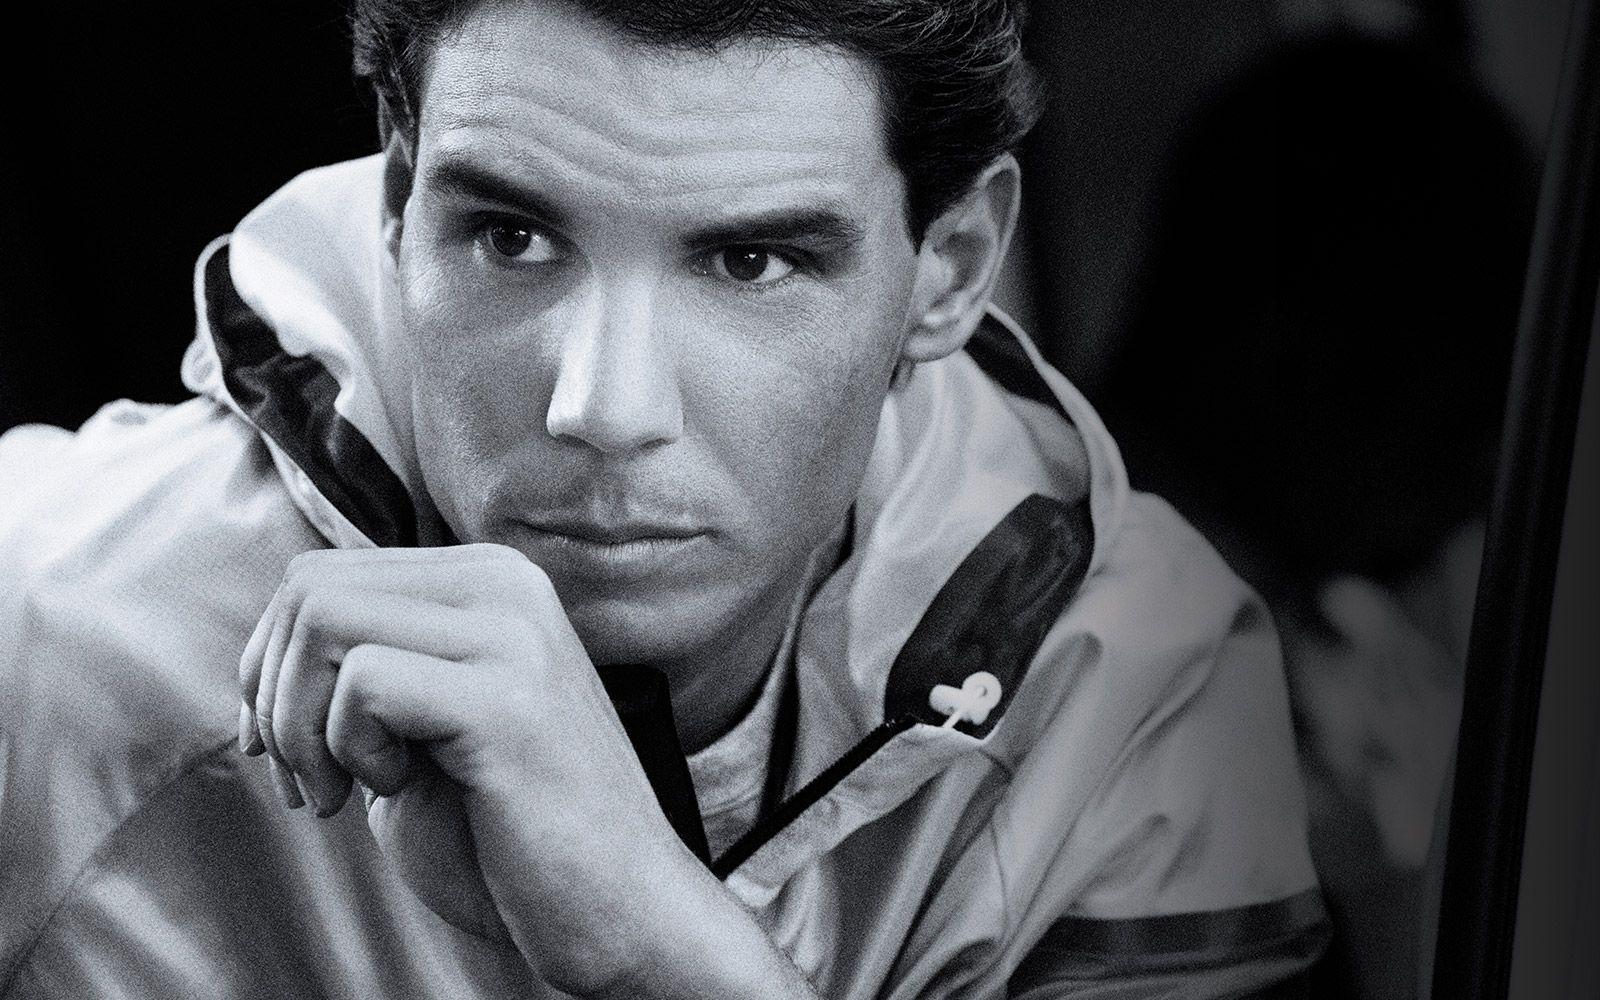 medallista Anguila toda la vida  PHOTOS: Rafael Nadal models for new Nike Tech Pack campaign – Rafael Nadal  Fans